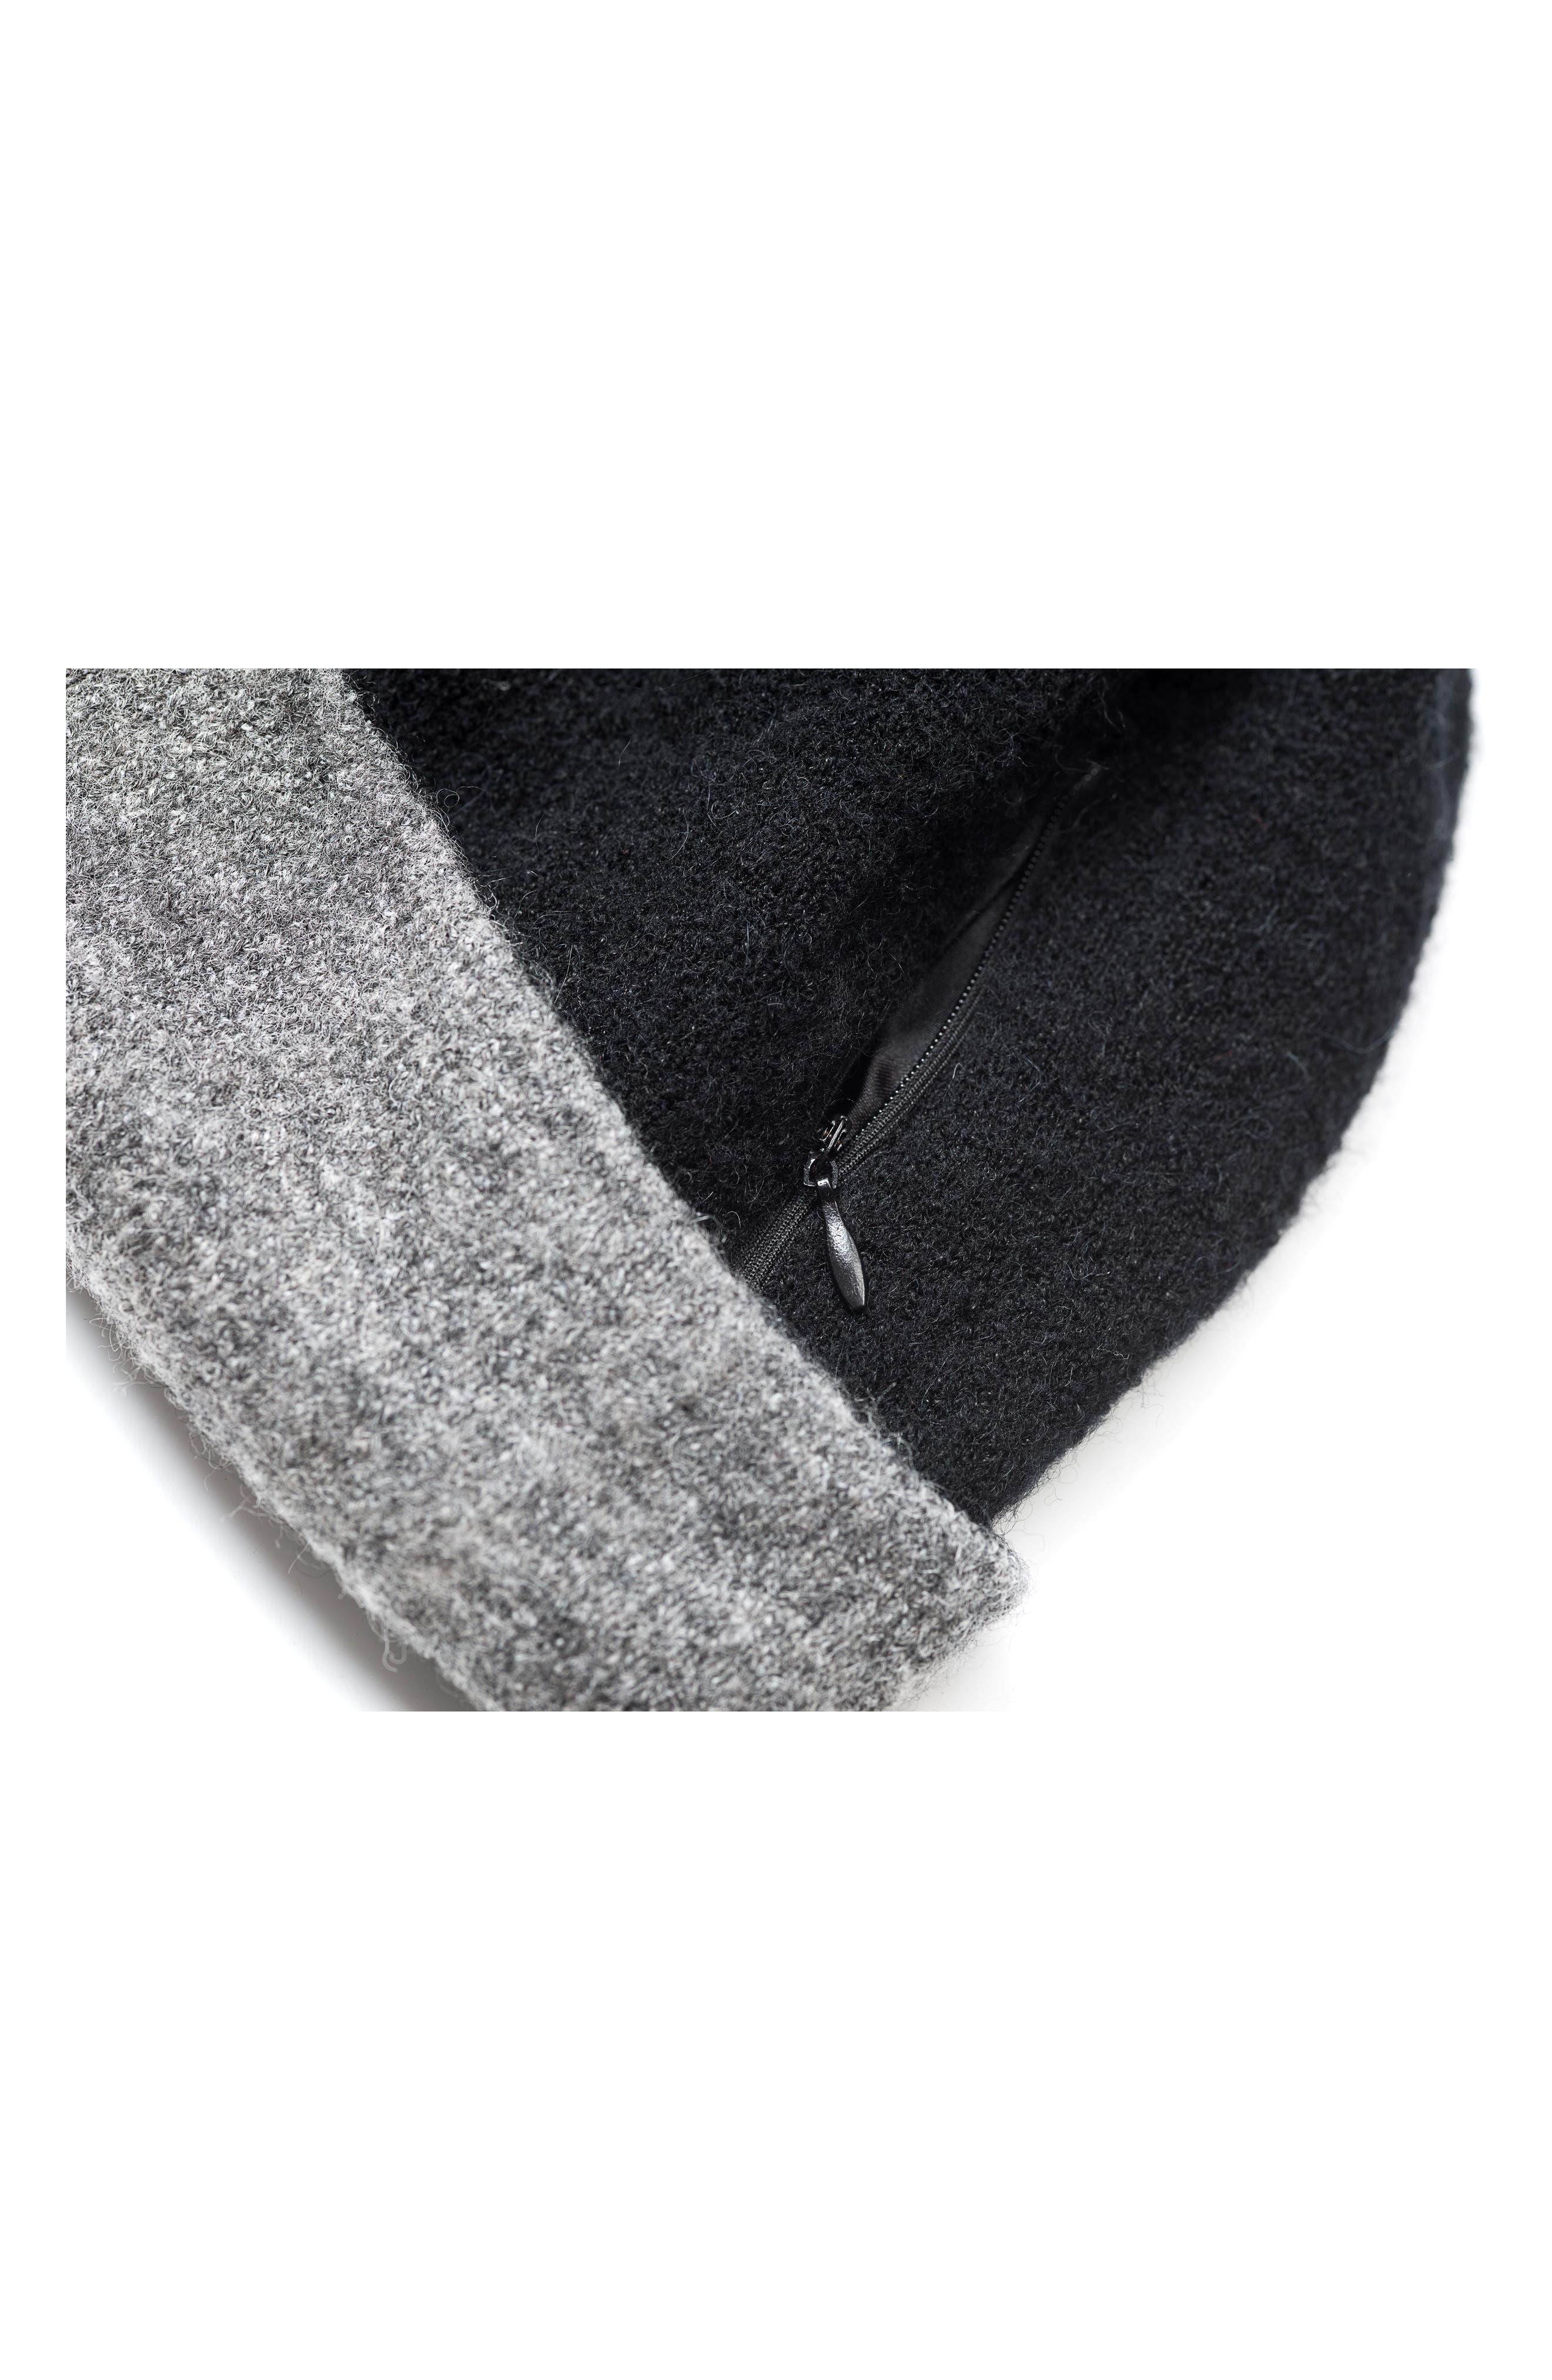 Double Happiness Reversible Knit Cap,                             Alternate thumbnail 3, color,                             270